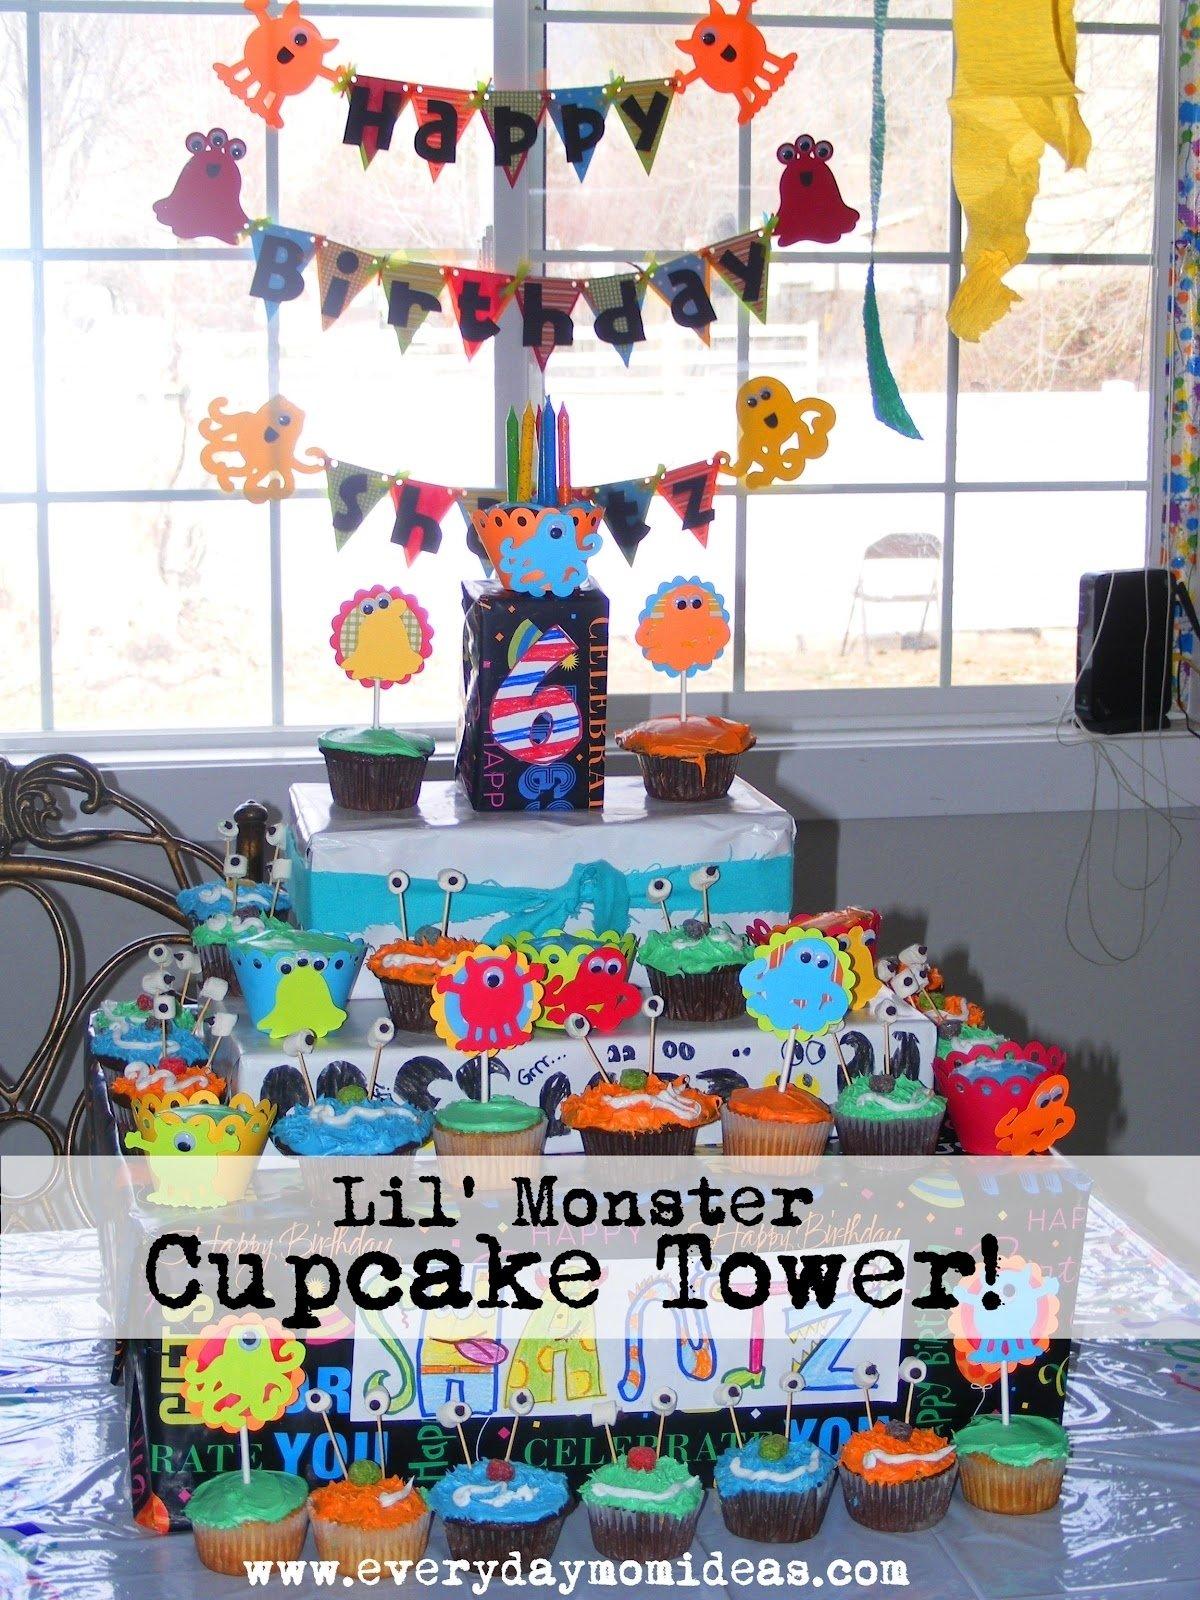 10 Unique 5 Year Old Boy Birthday Party Ideas little monster bash birthday party ideas everyday mom ideas 6 2021